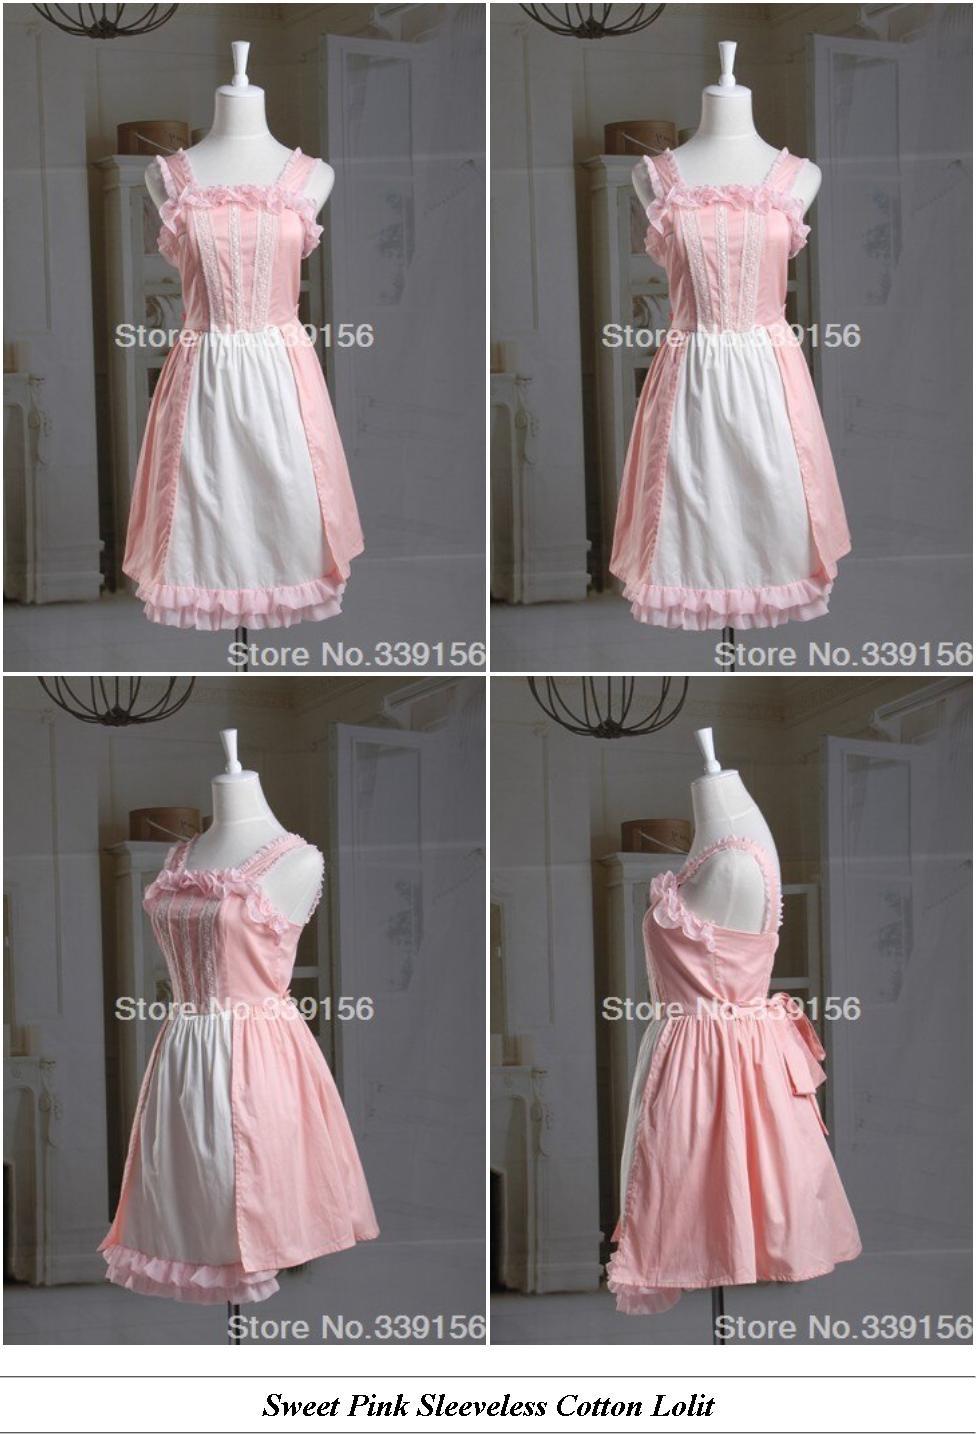 Wrap Dress Pattern - Watch Clearance Sale Usa - Silk Dresses Short